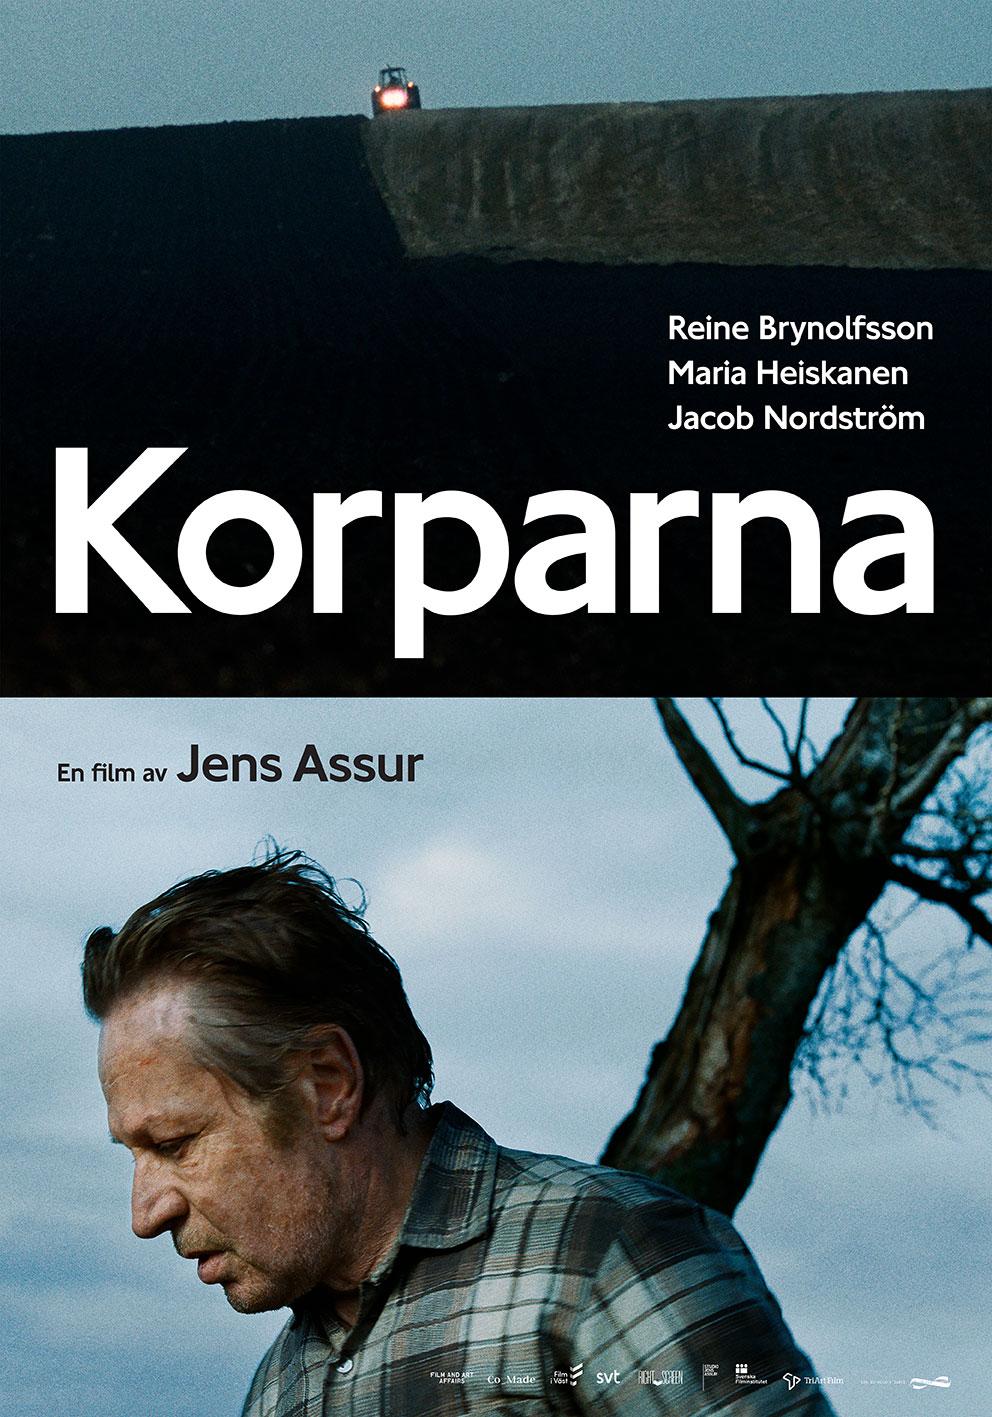 korparna_poster.jpg